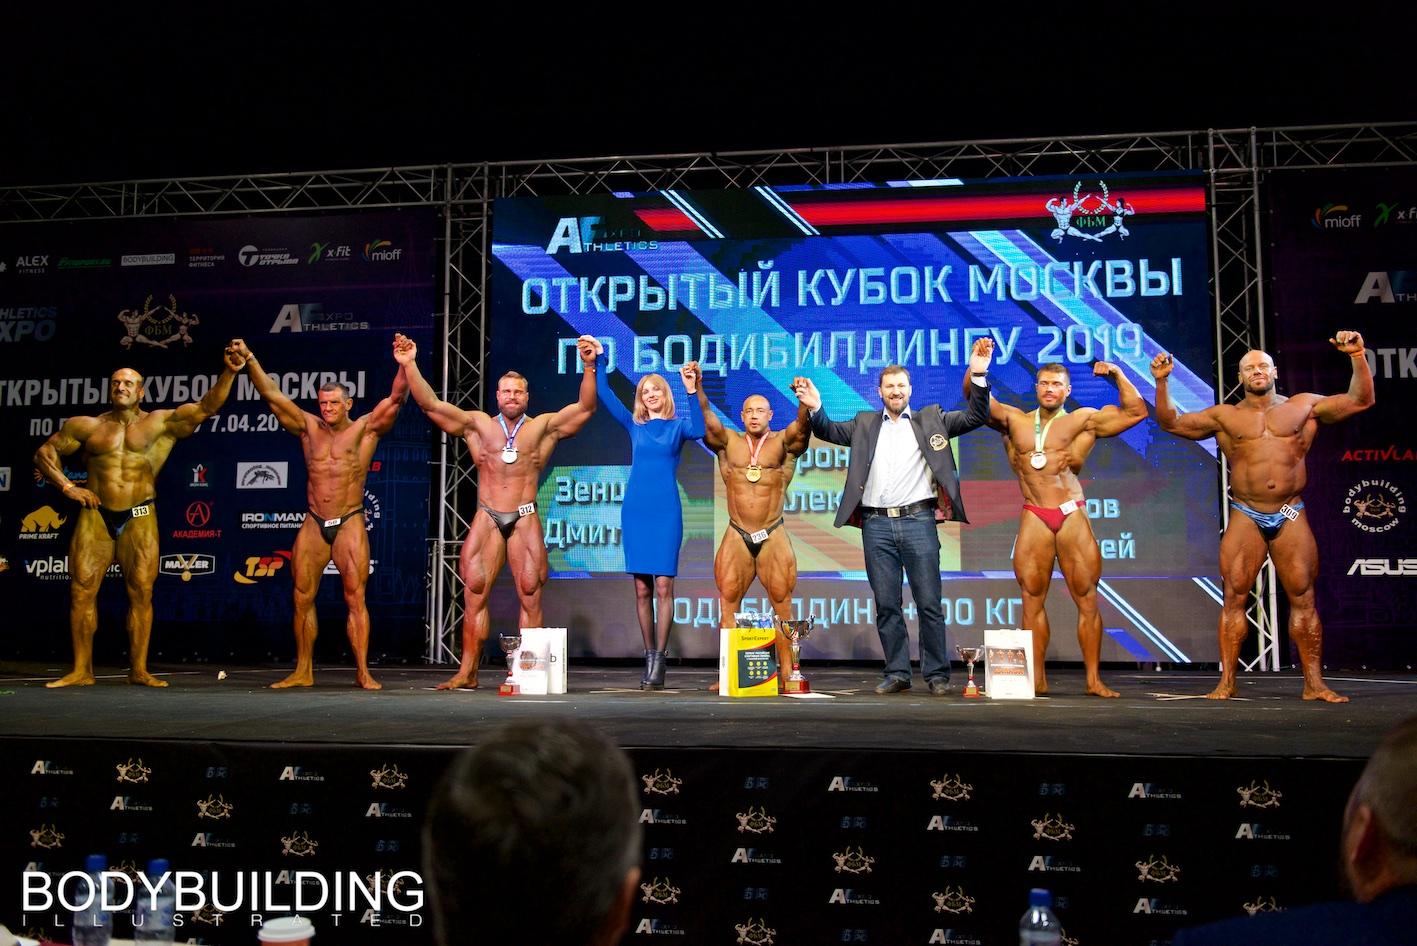 Кубок Москвы по бодибилдингу 2019